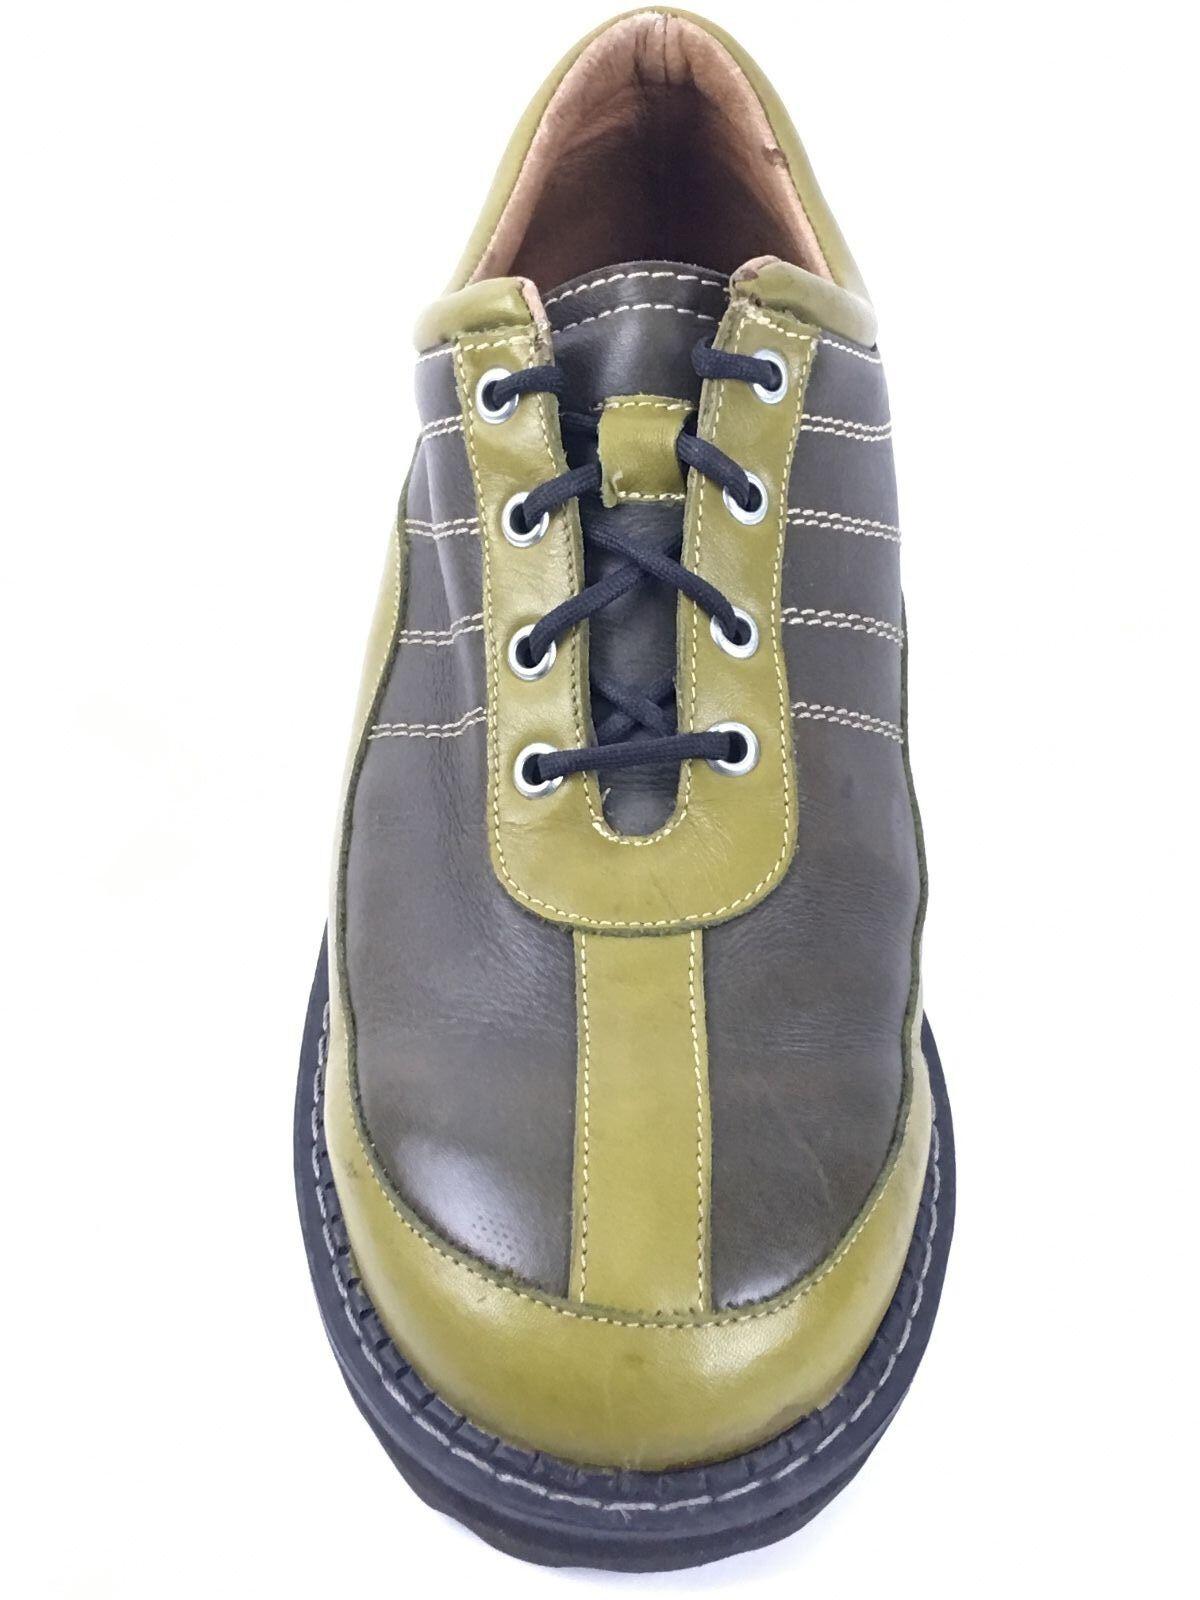 John Fluevog Men's  shoes Size US. 11 UK10.5. EUR.44- 1028